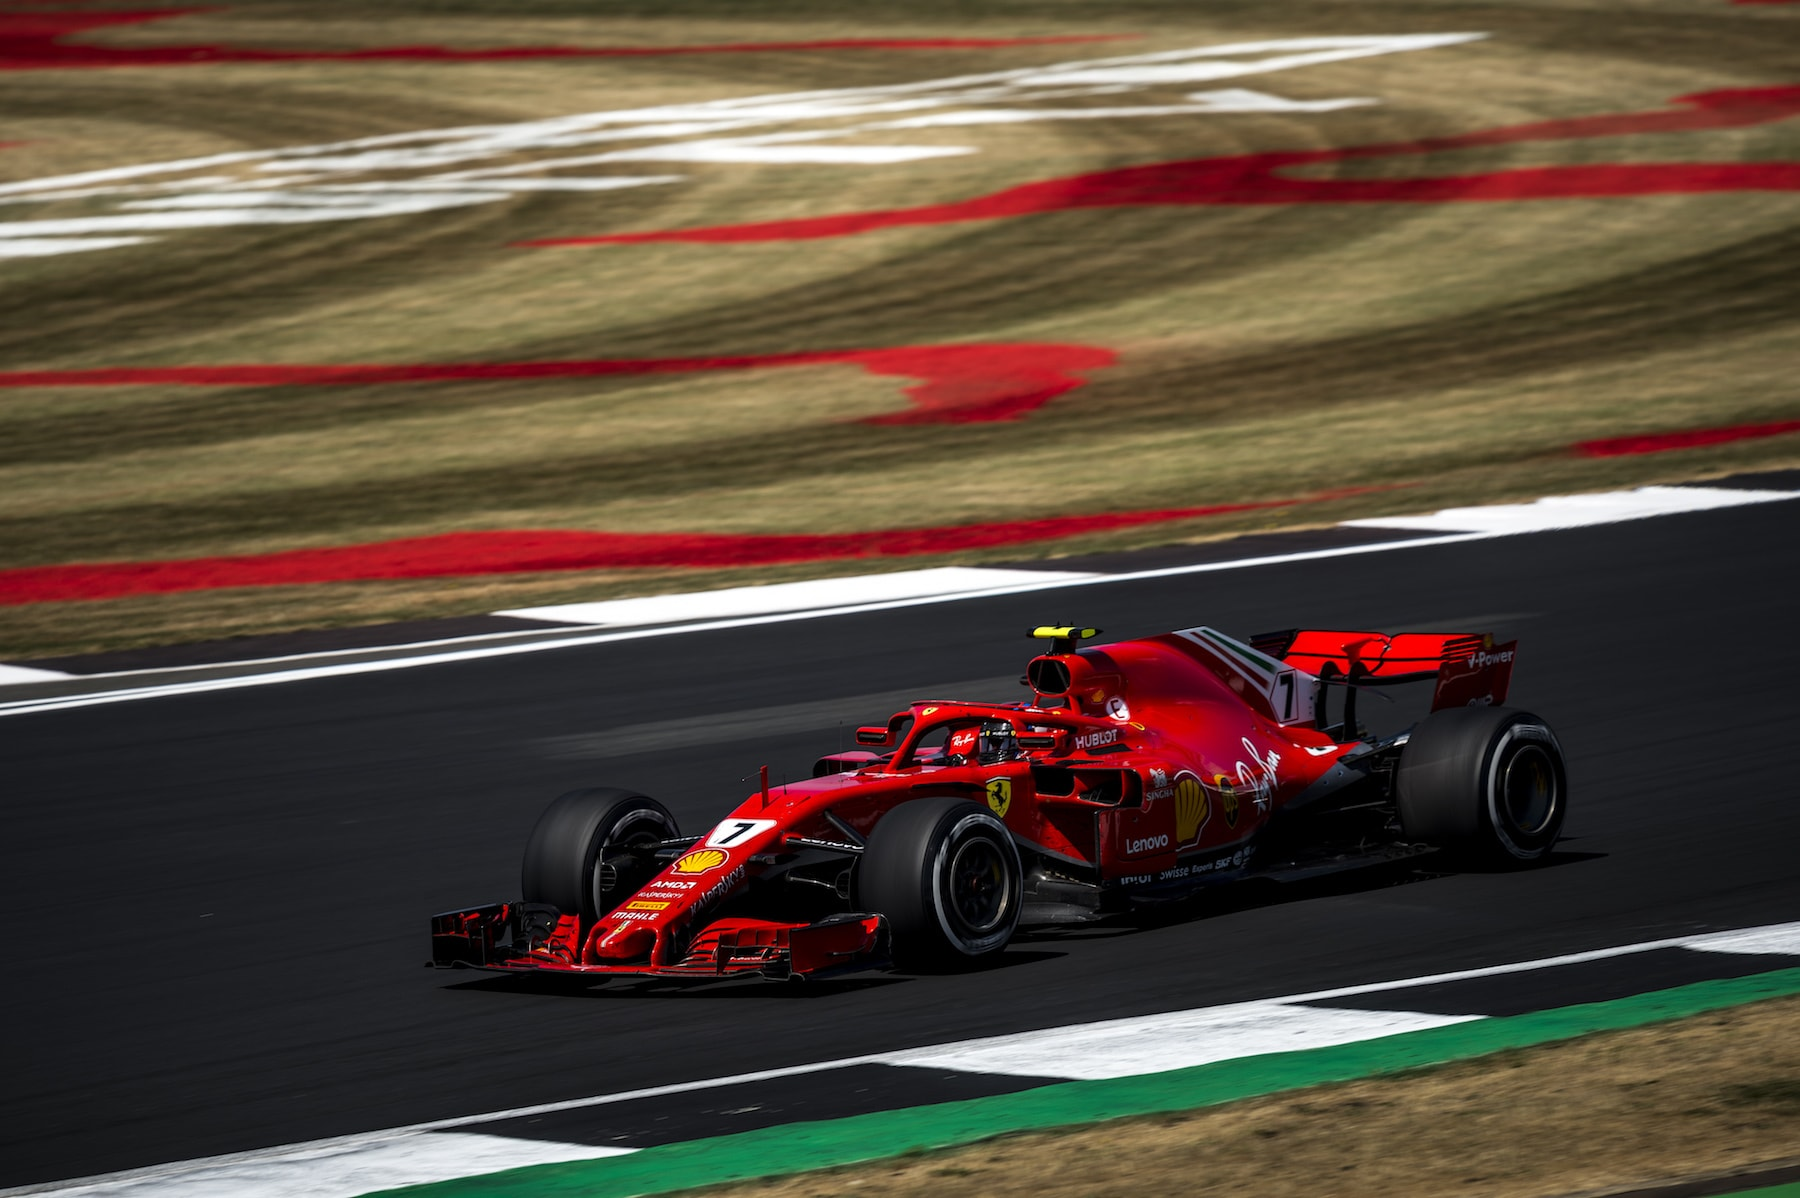 H 2018 Kimi Raikkonen | Ferrari SF71H | 2018 British GP P3 3 copy.jpg